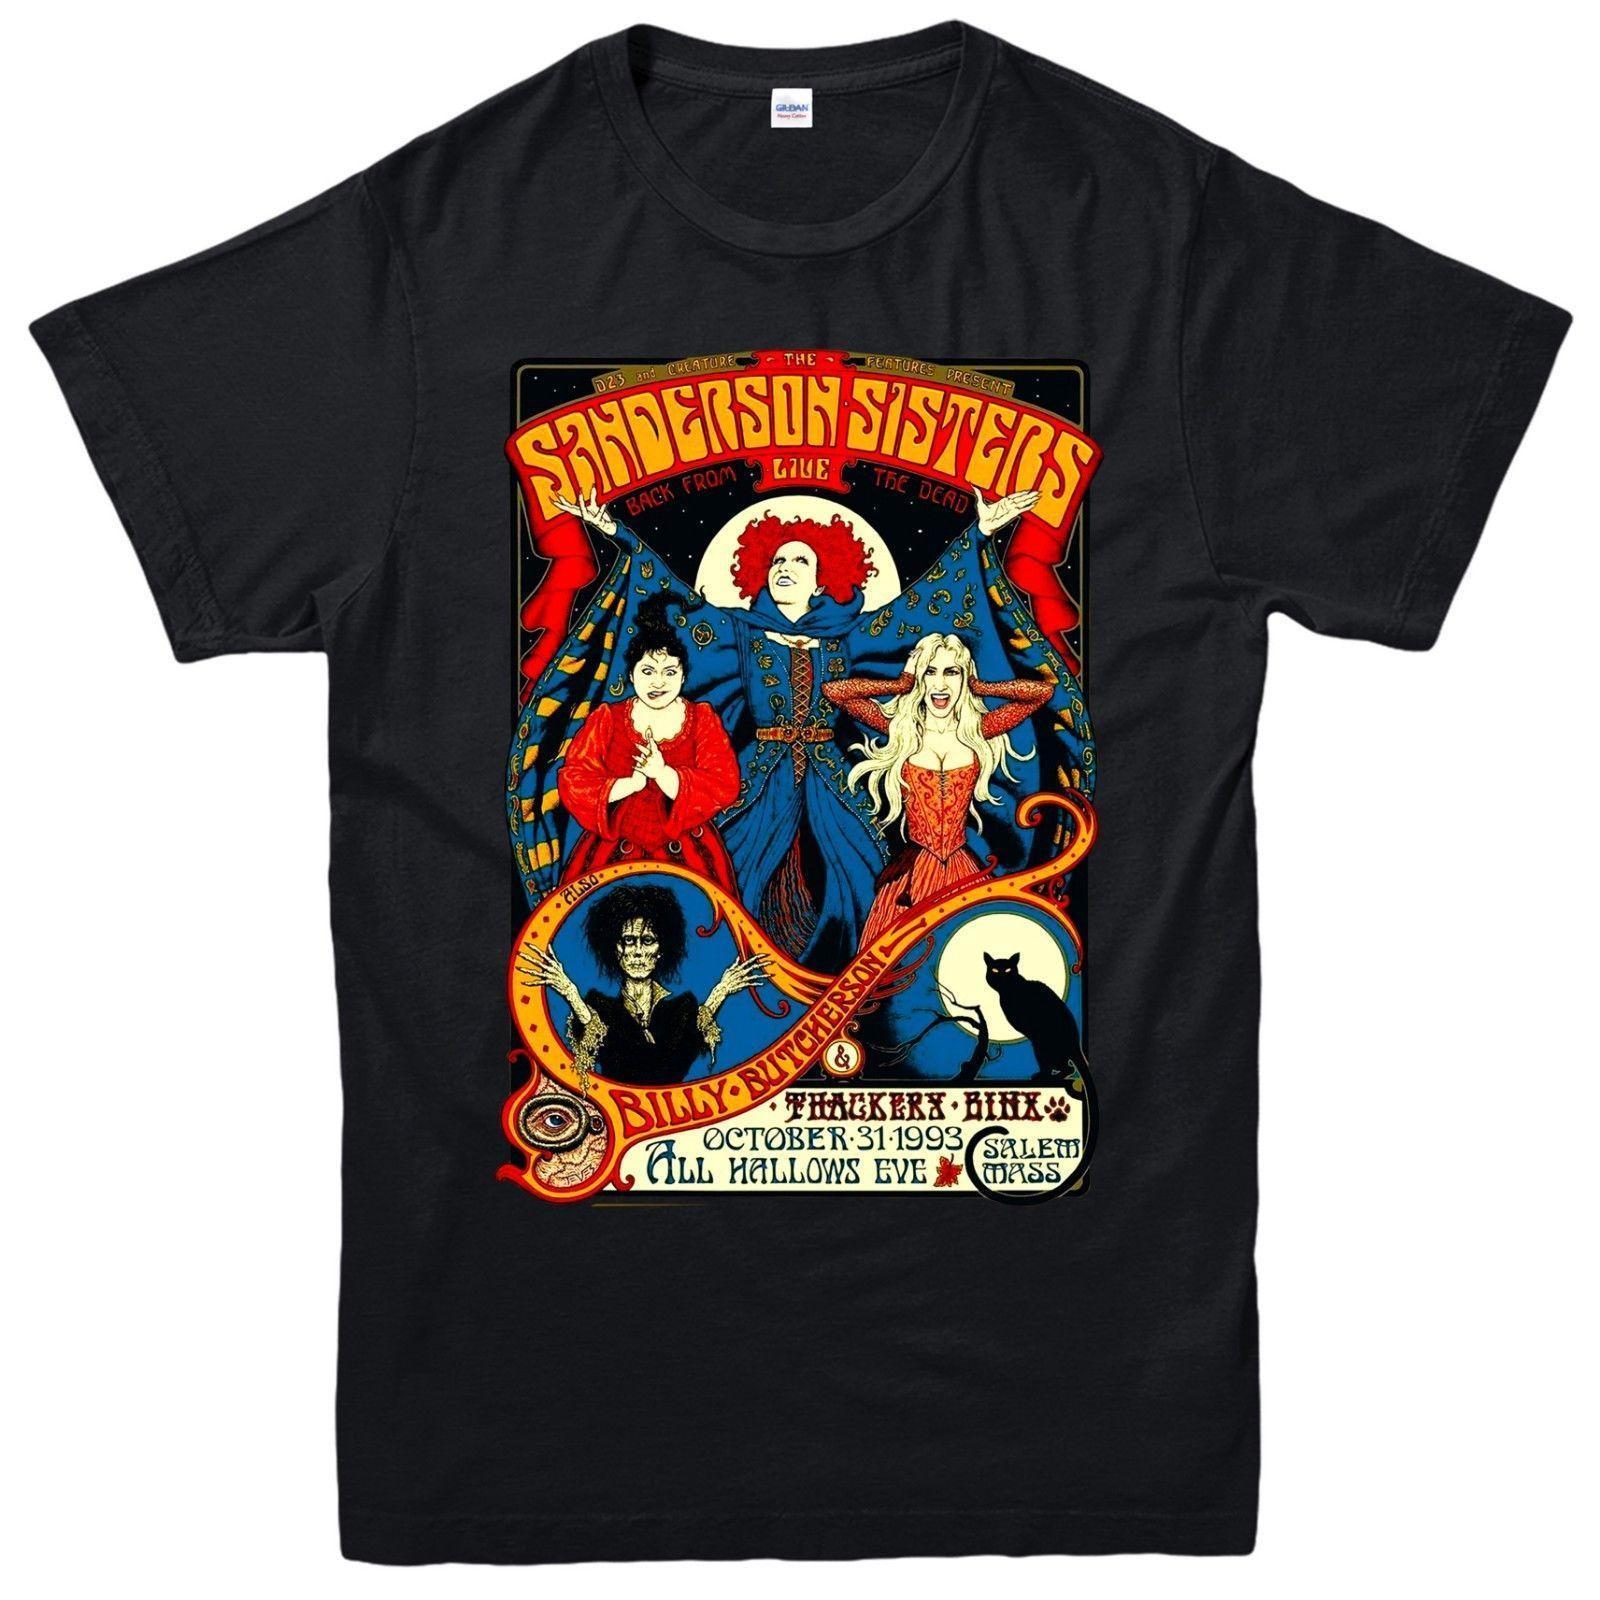 da148acb6 Details Zu Sanderson Sisters T Shirt Classic Retro Hocus Pocus Halloween  Adult Kids Tee Top Funny Unisex Cool Sweatshirts Online Random Funny T  Shirts From ...